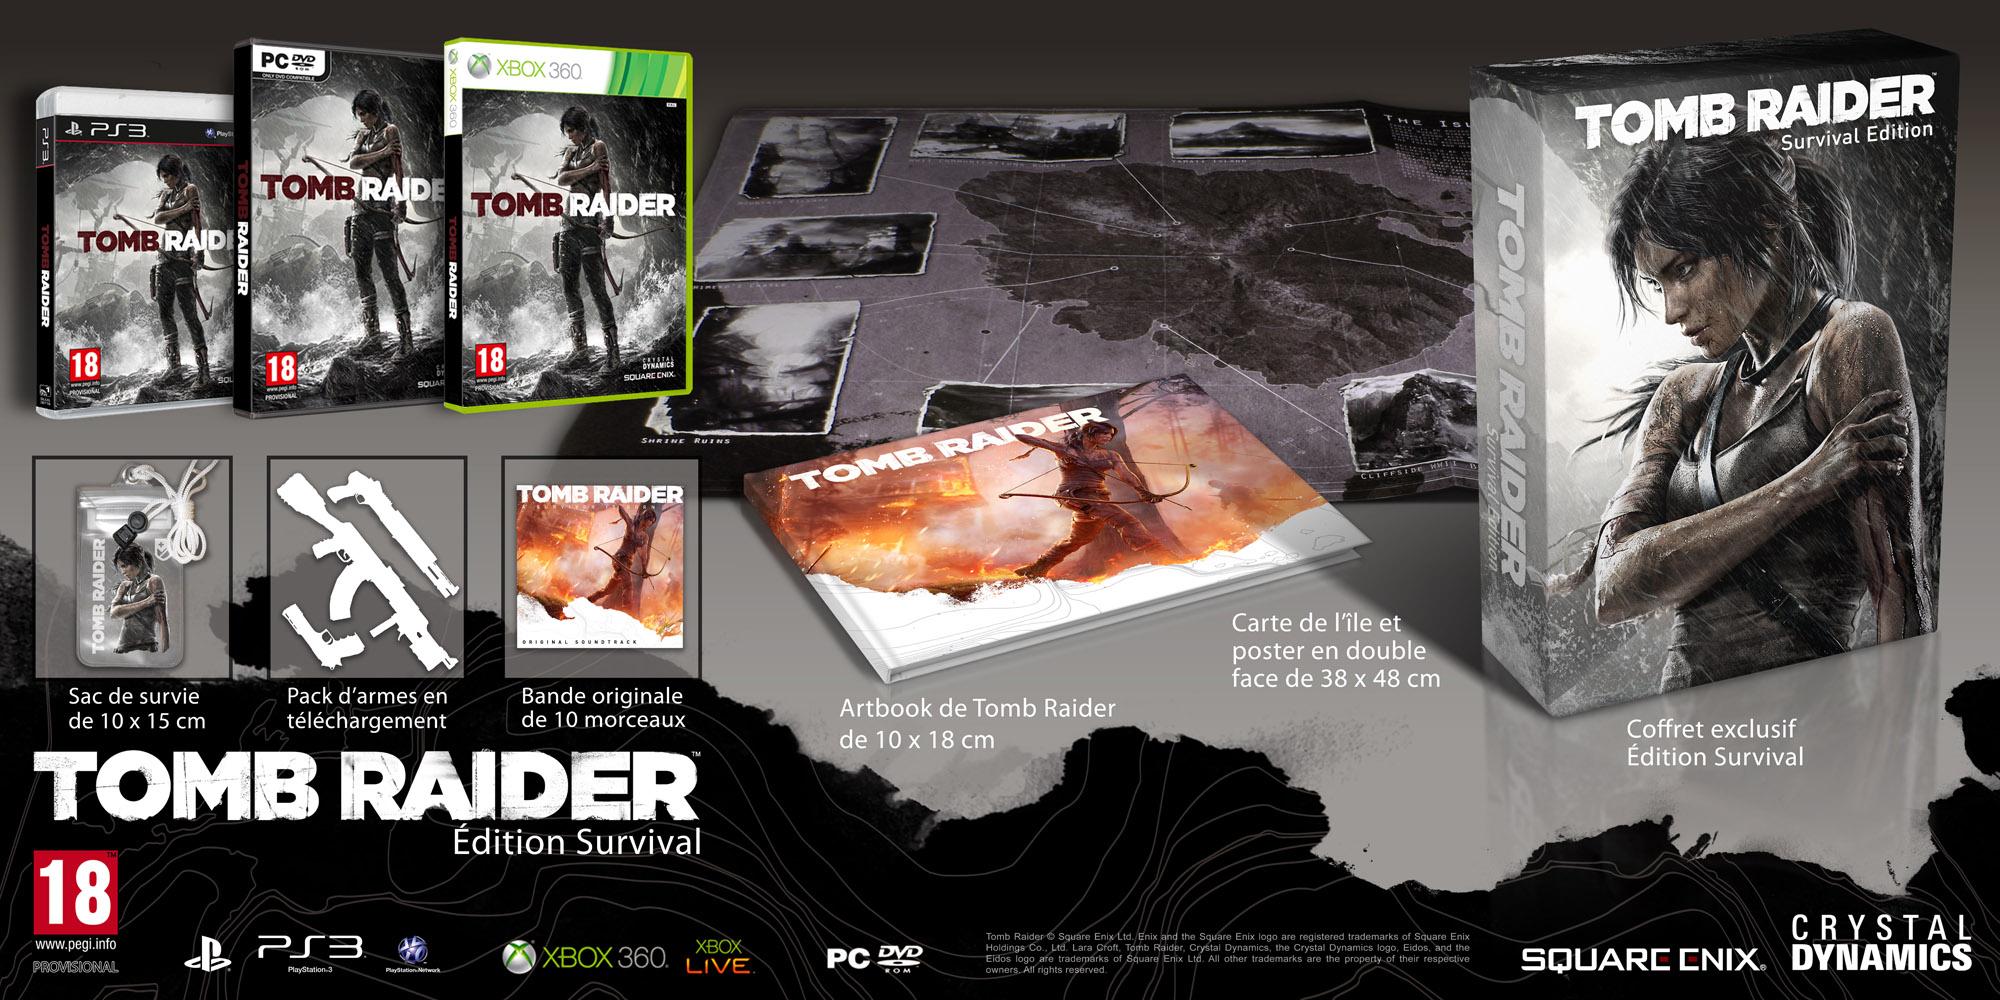 Tomb Raider - Edition Survival